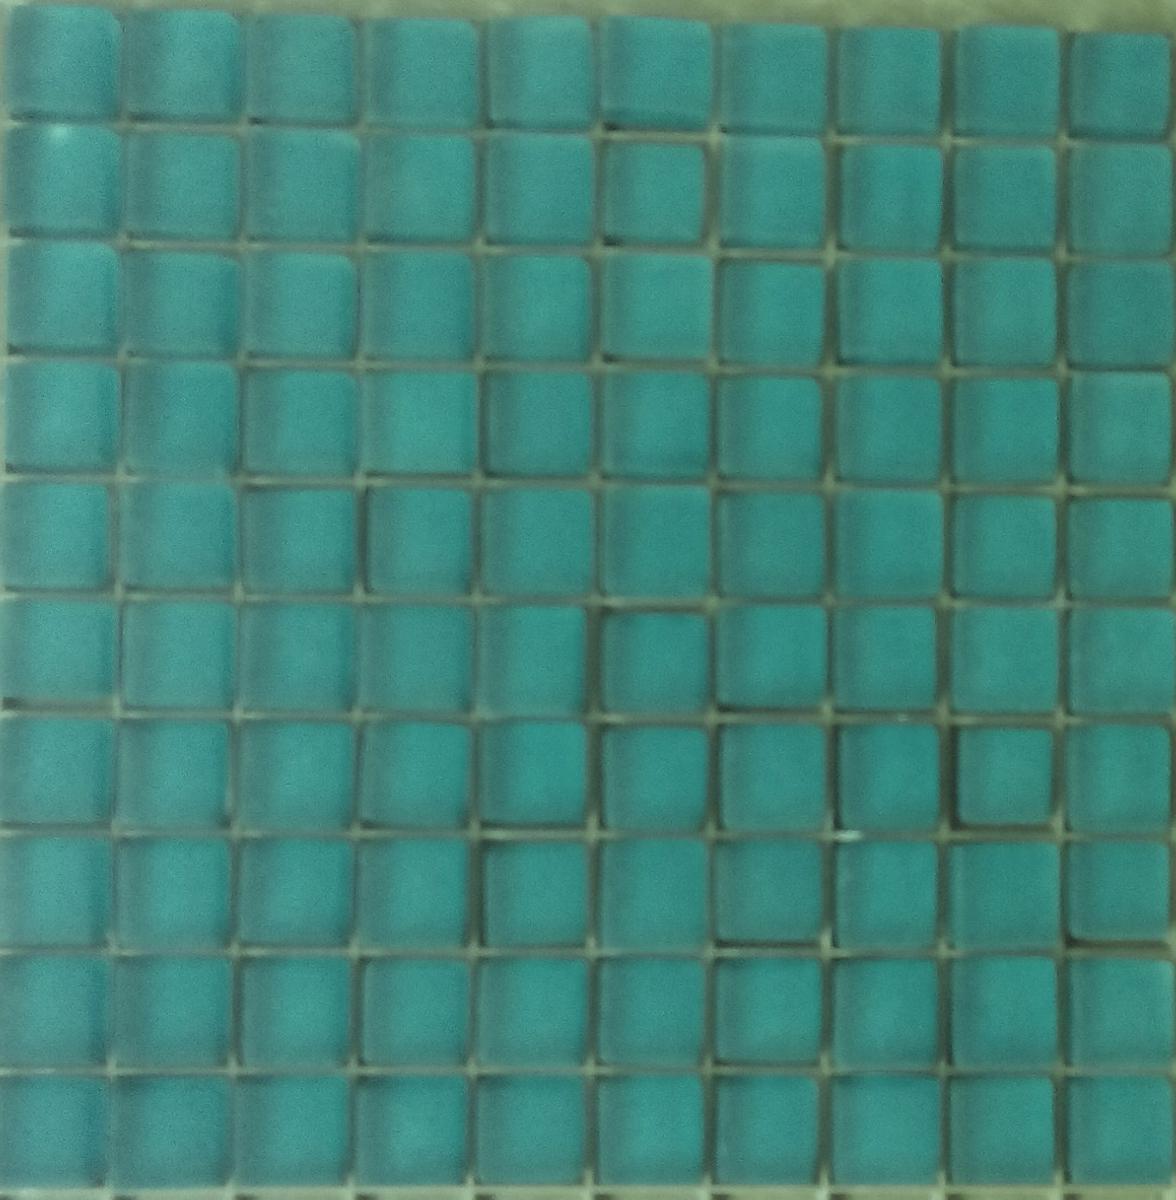 Carrelage Salle De Bain Vert Emeraude ~ carrelage mosaique vert